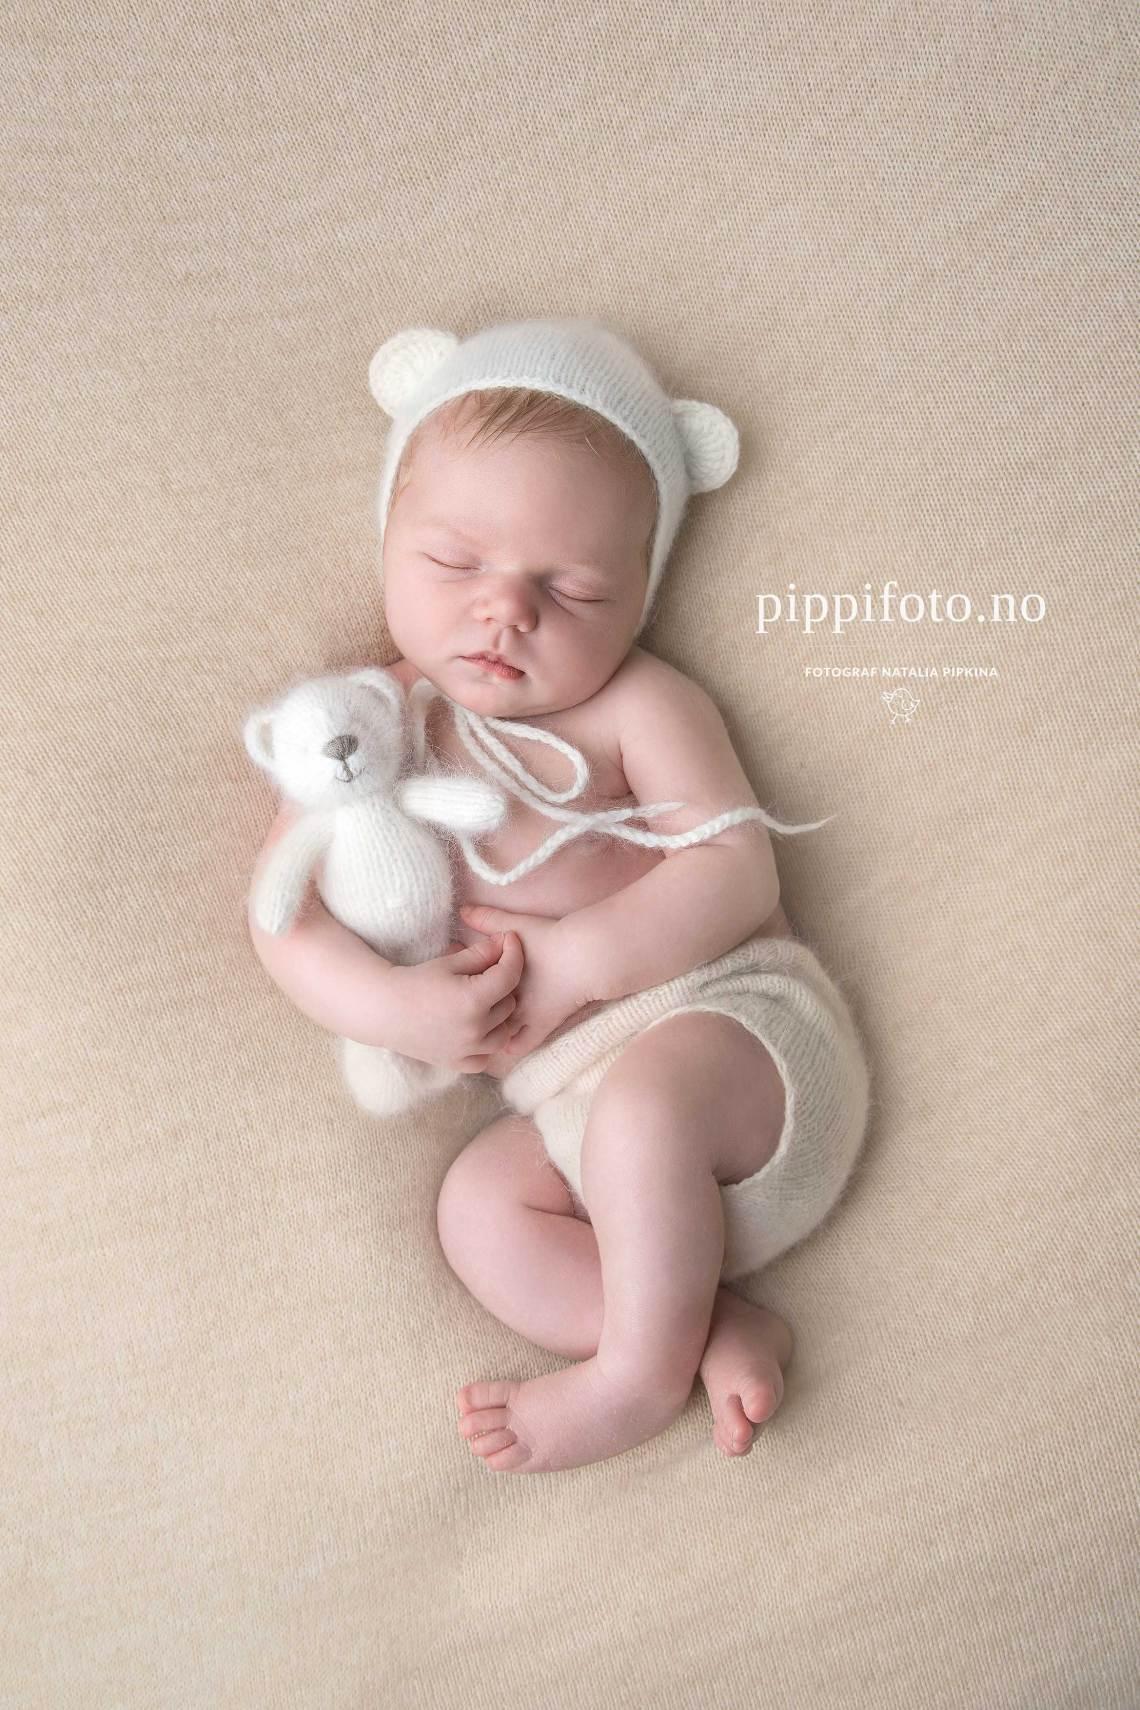 nyfødtfotografering-oslo-babyfotografering-gravidfotografering